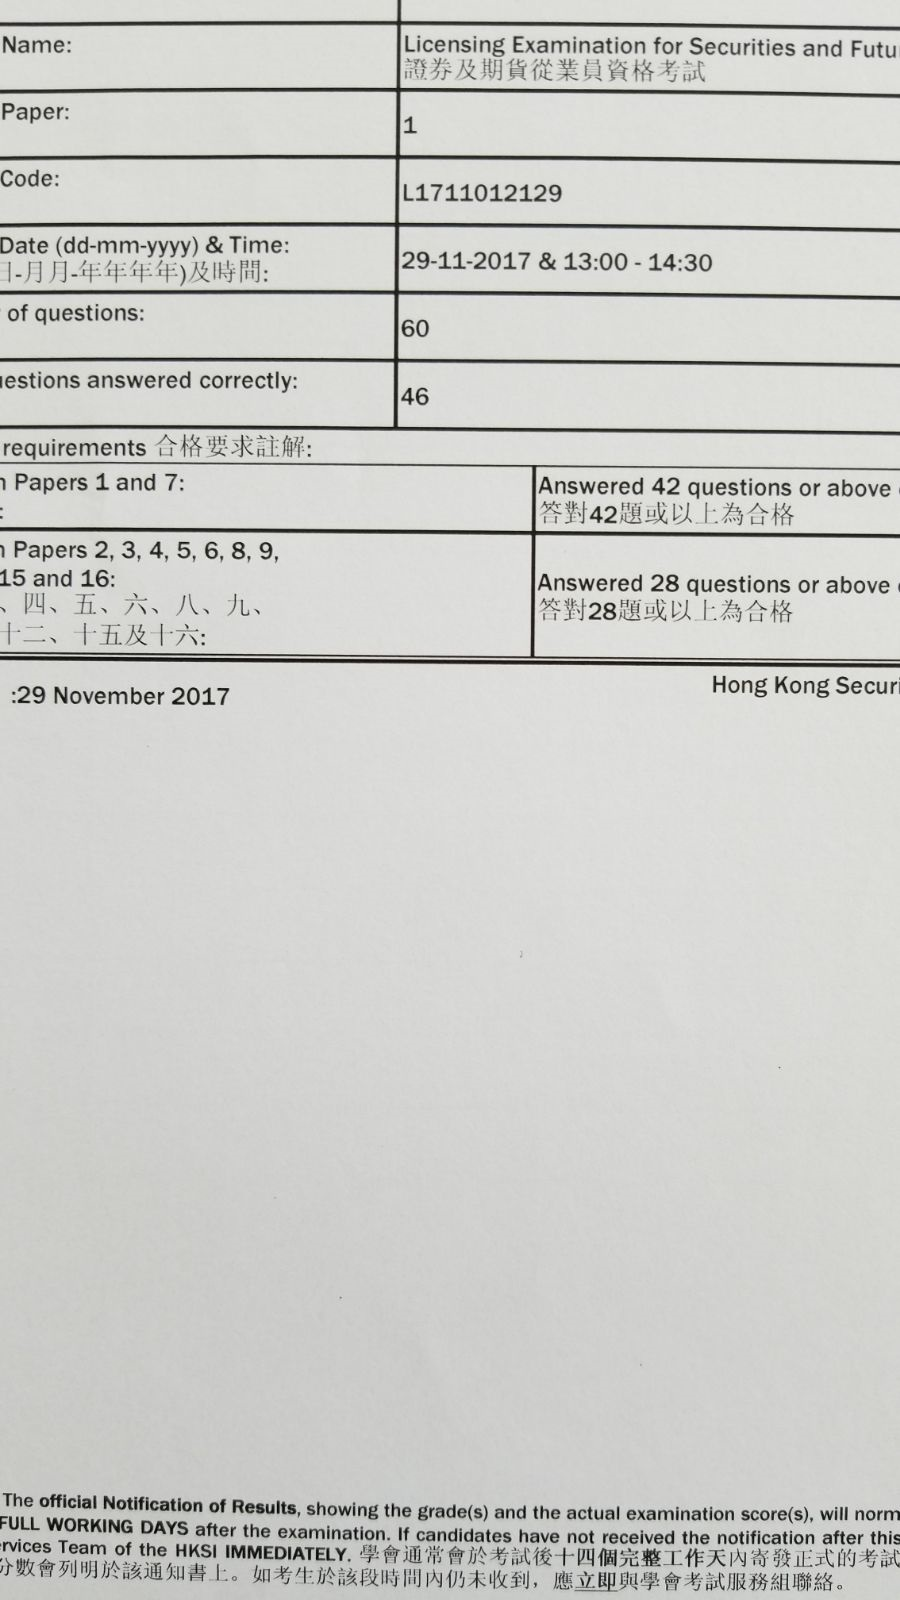 SLL 29/11/2017 LE Paper 1 證券期貨從業員資格考試卷一 Pass